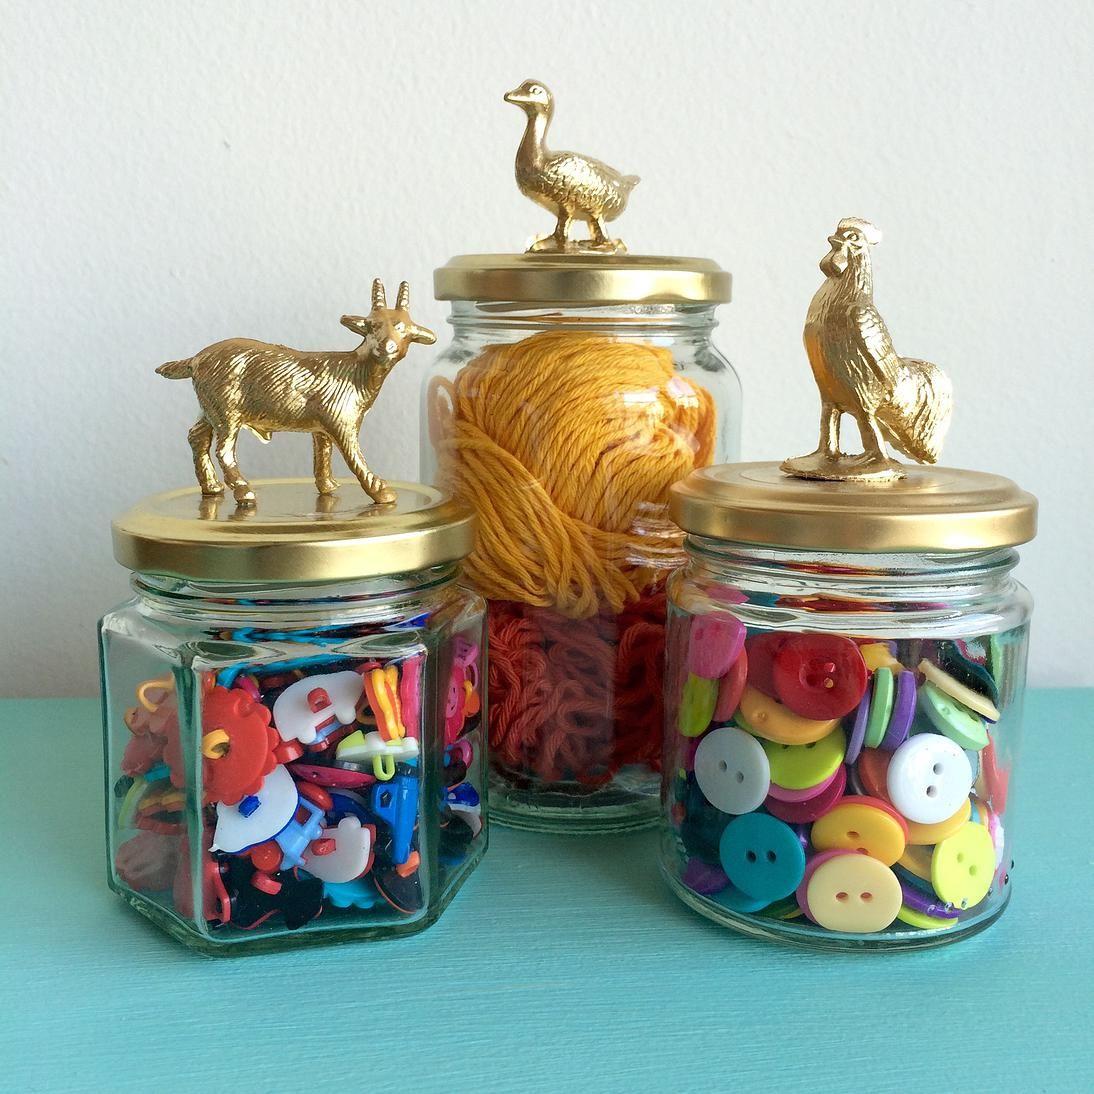 Diy frascos decorados con animalitos diy pinterest - Diy frascos decorados ...